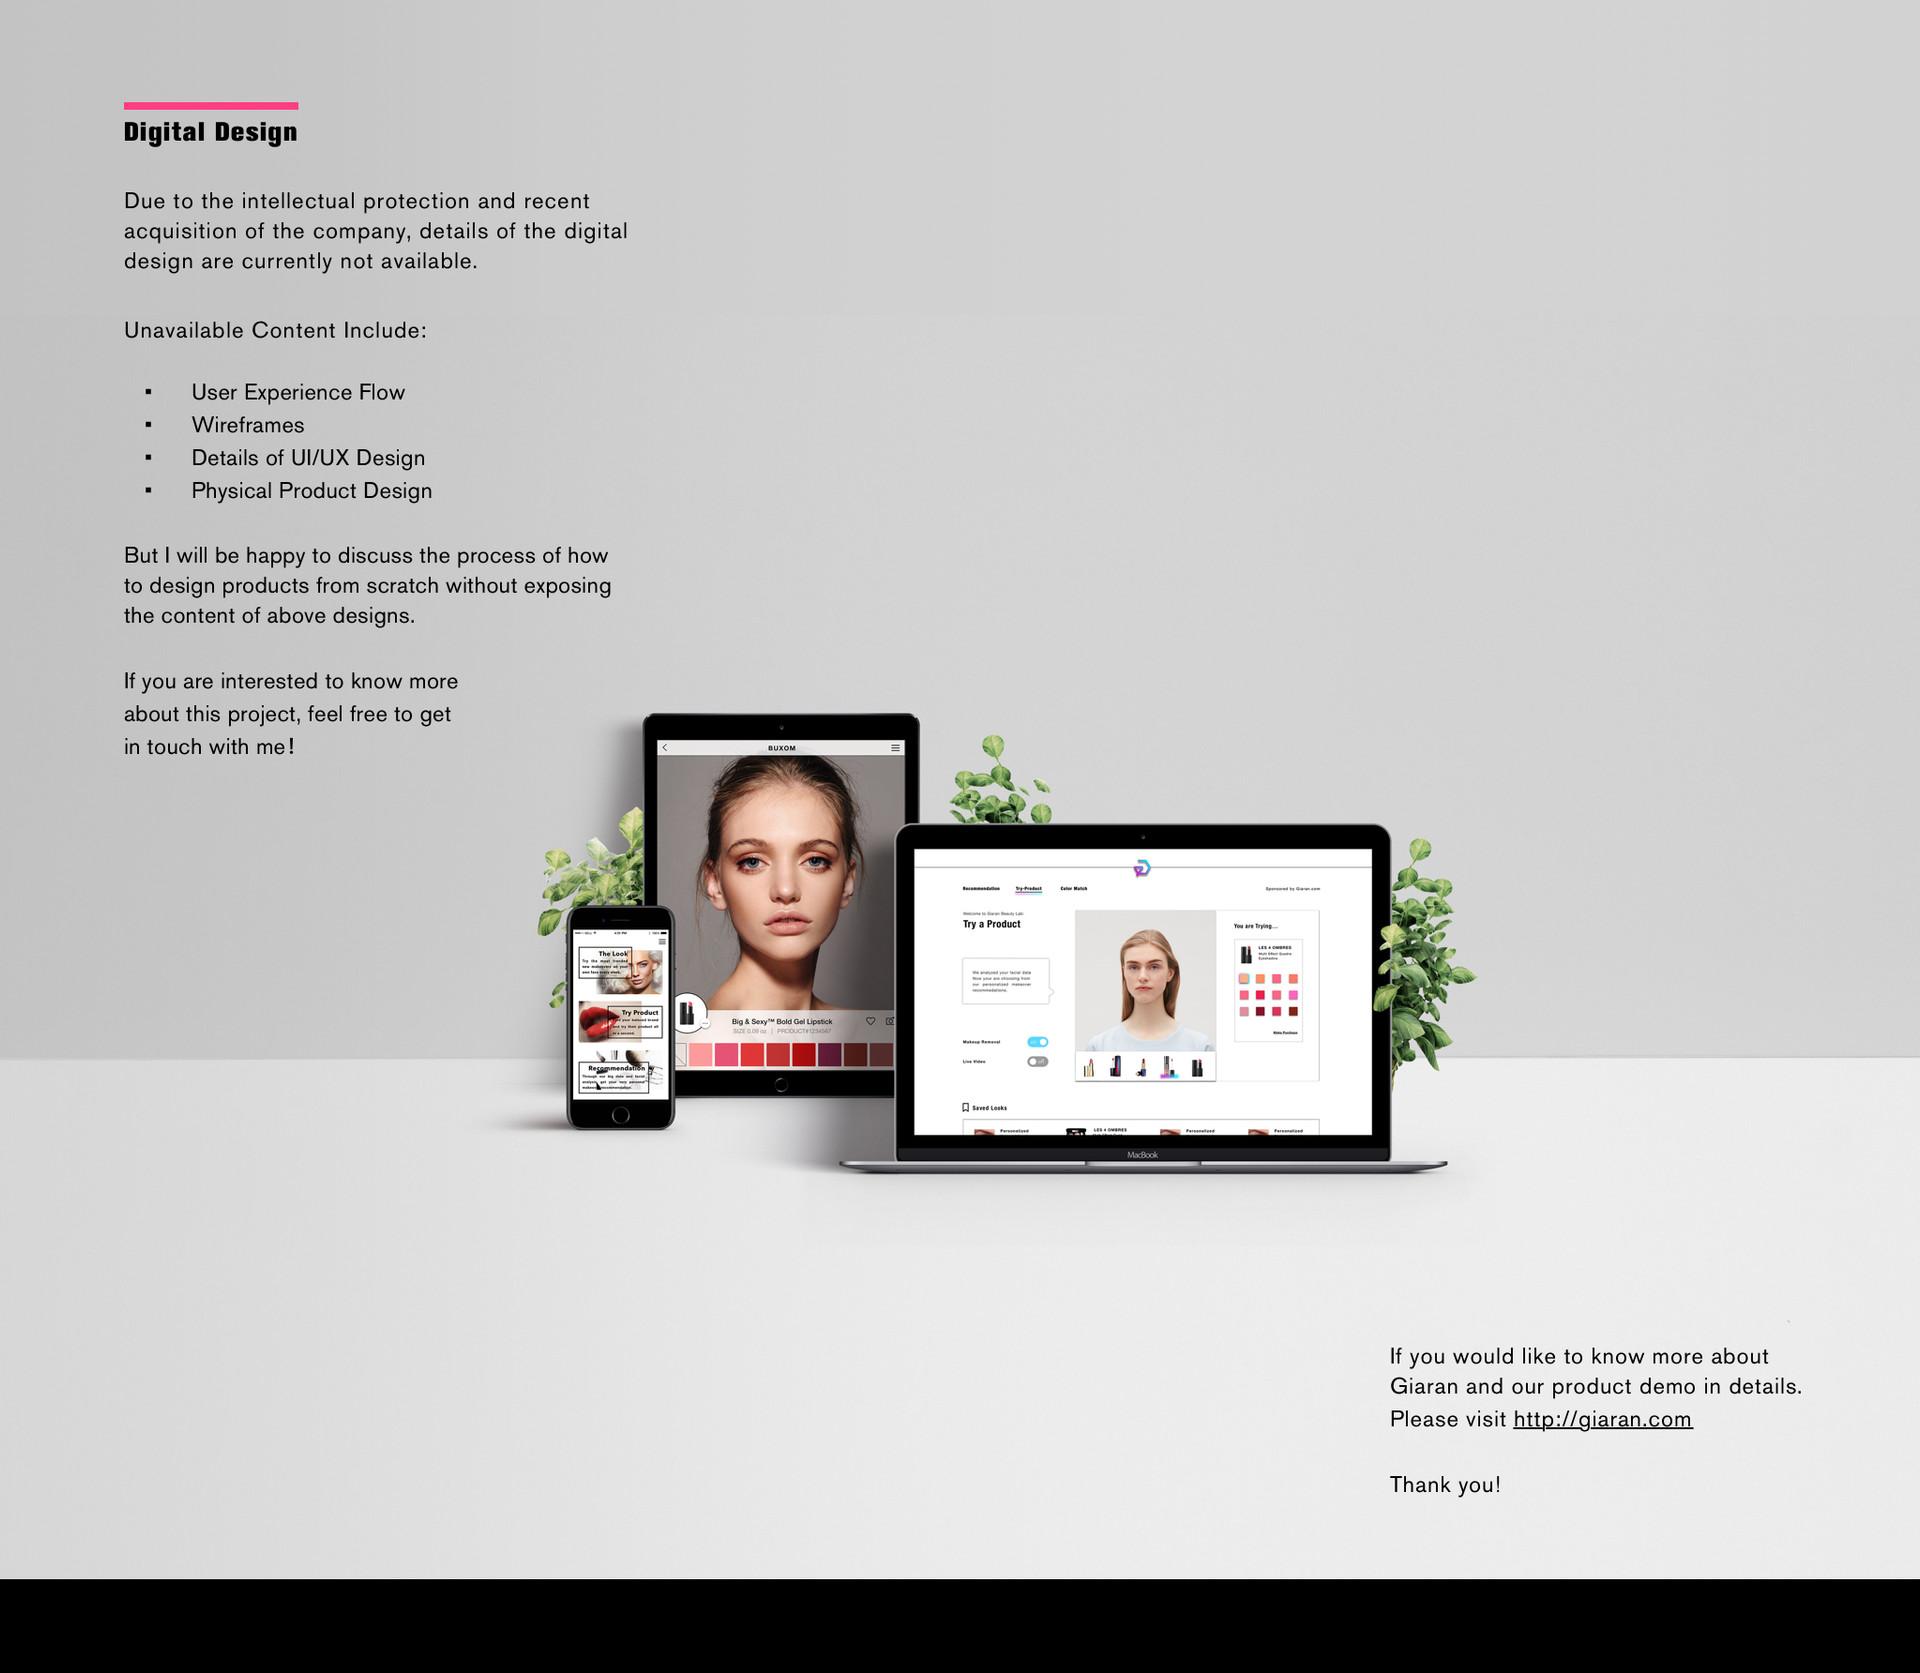 digital design.jpg